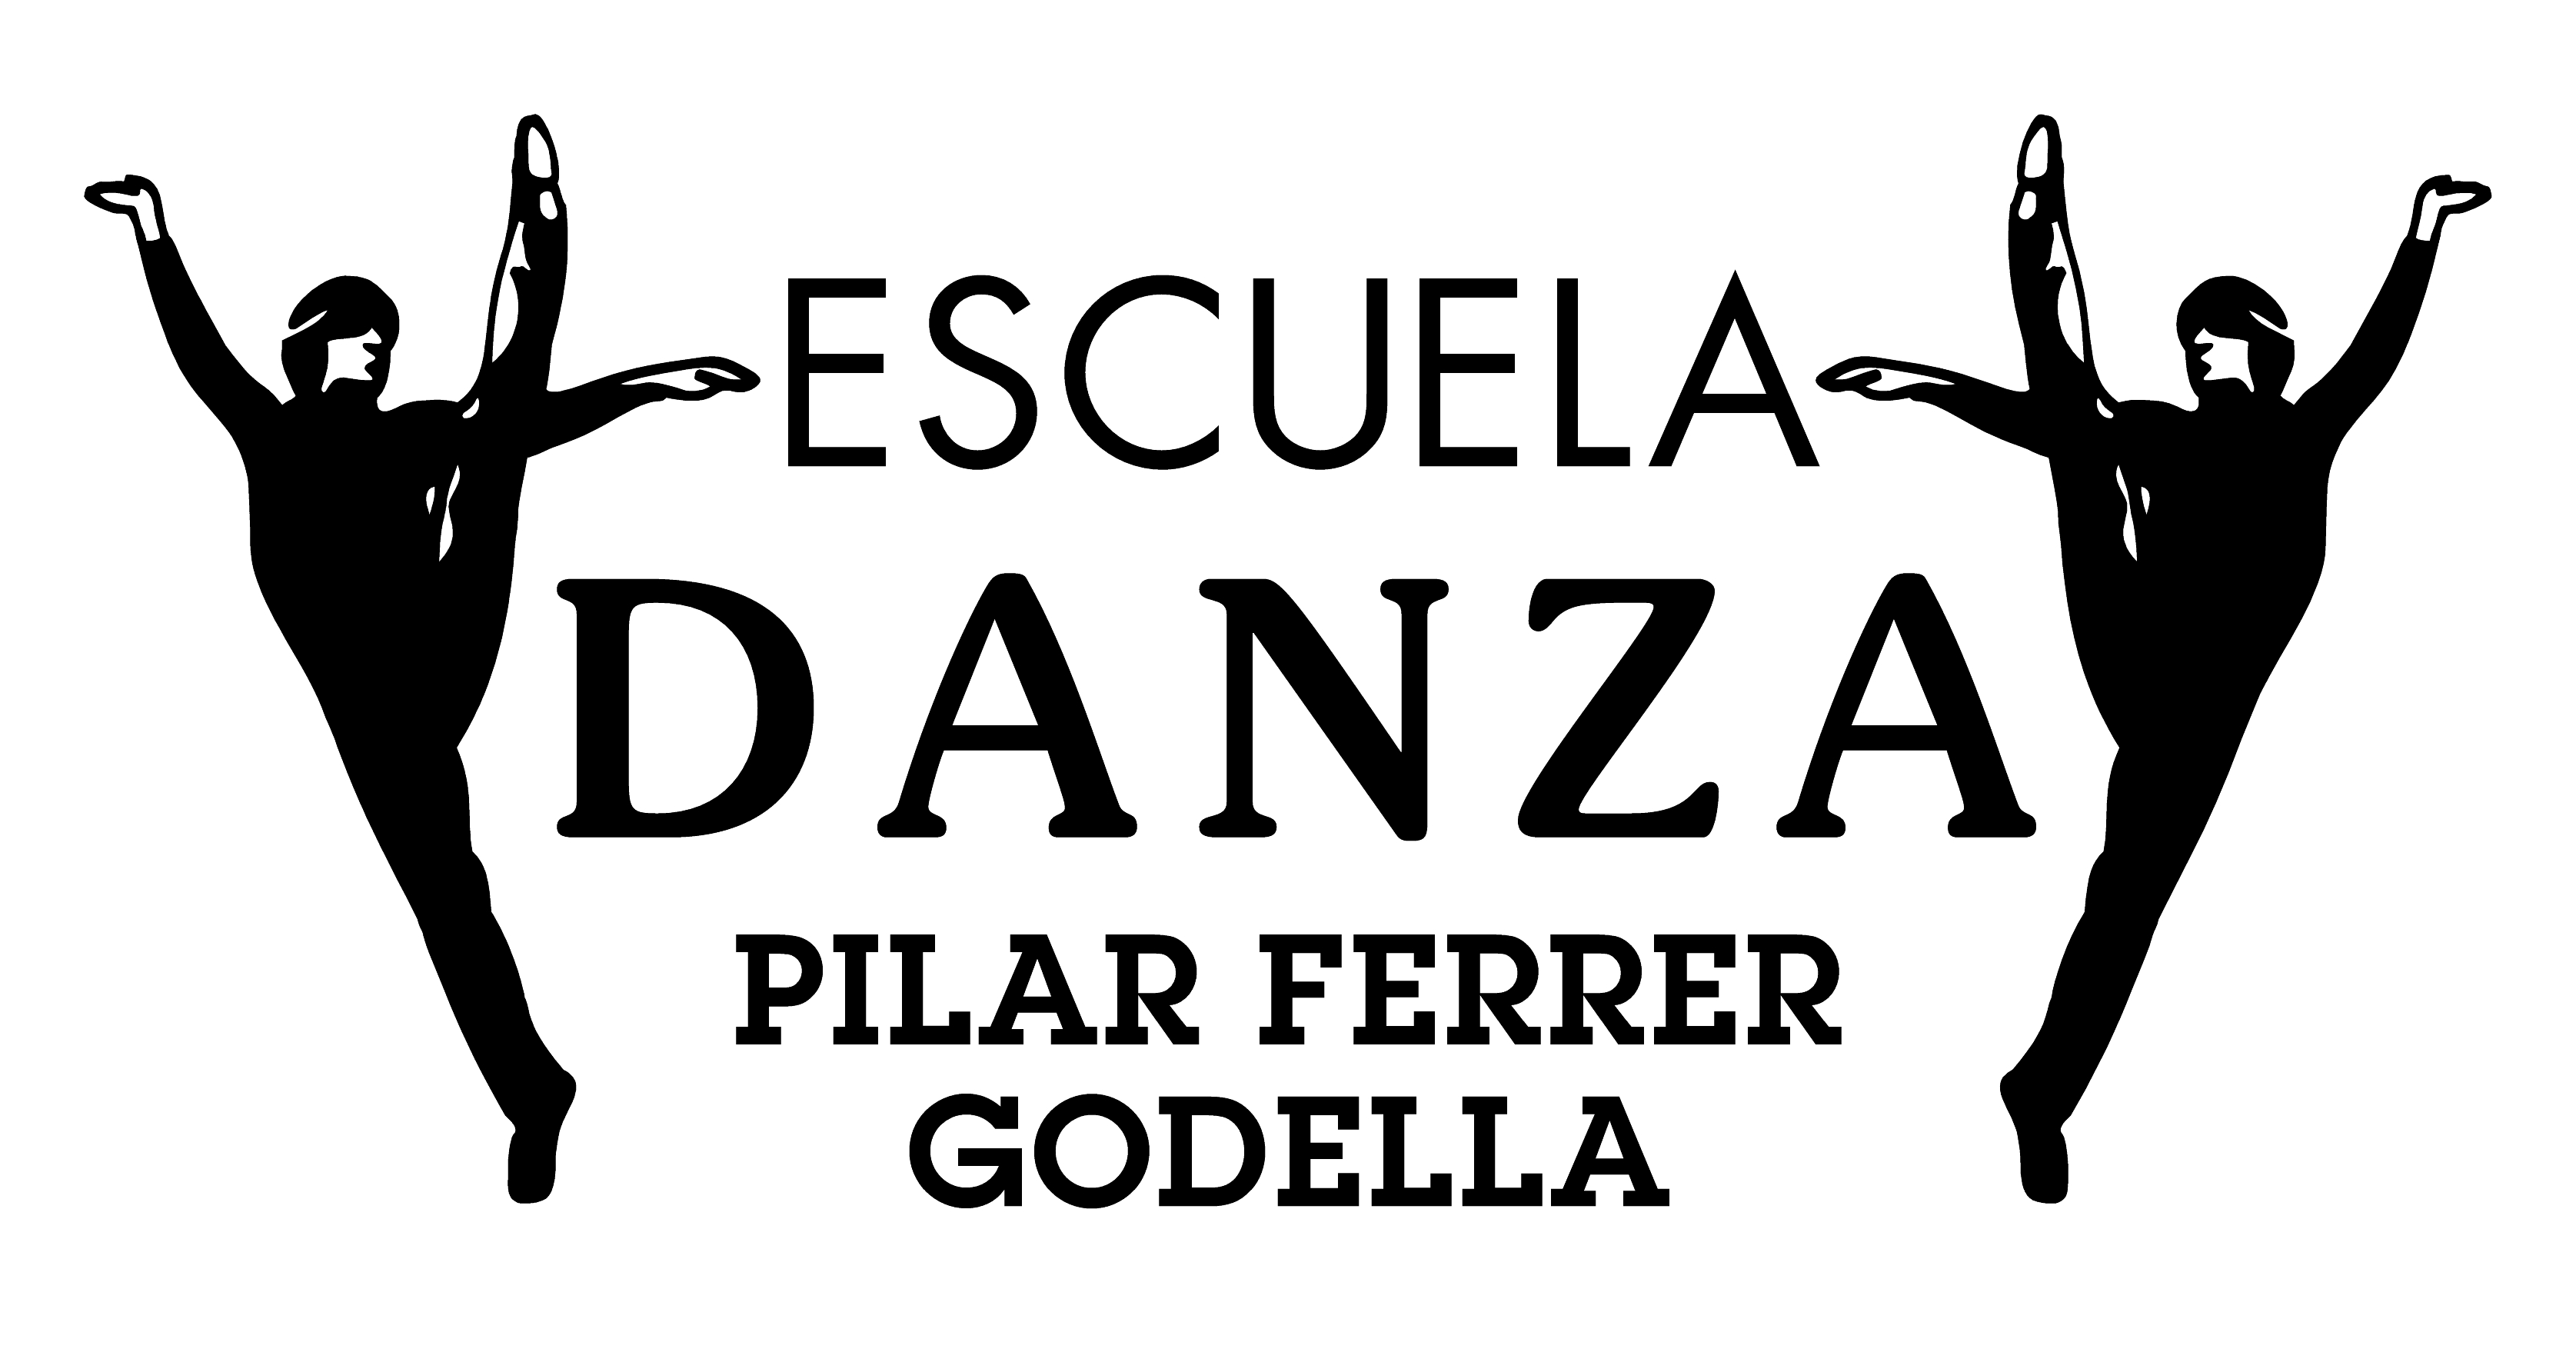 Escuela de Danza Pilar Ferrer